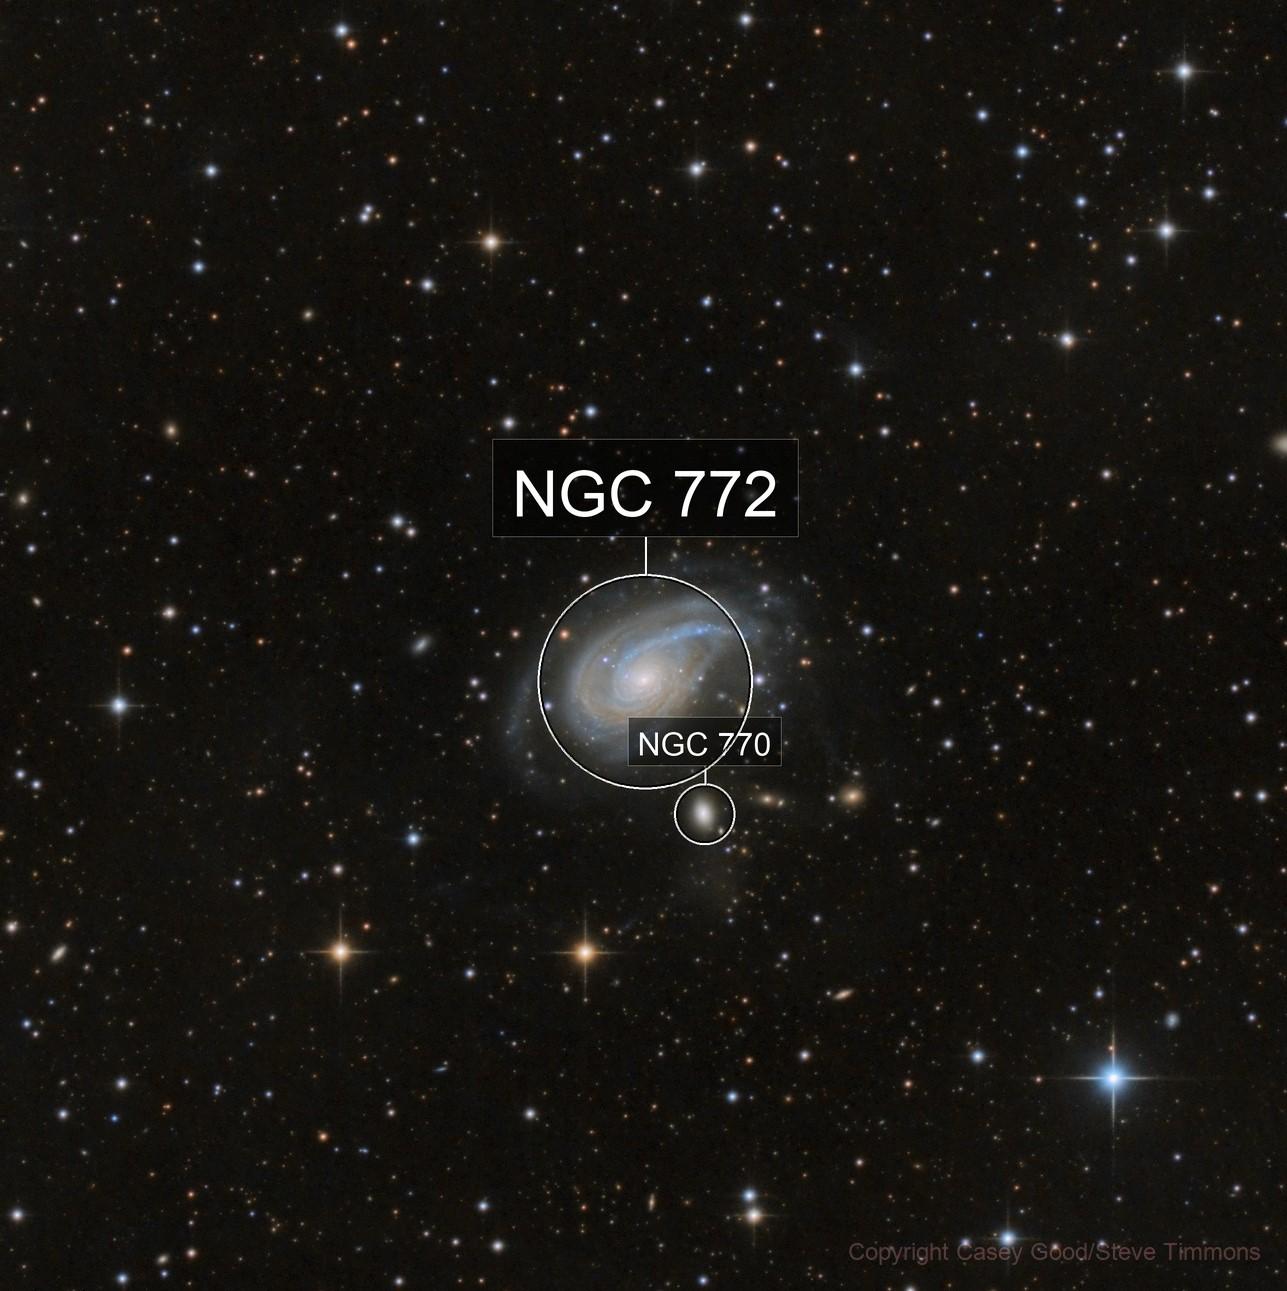 NGC 772 - The Nautilus Galaxy